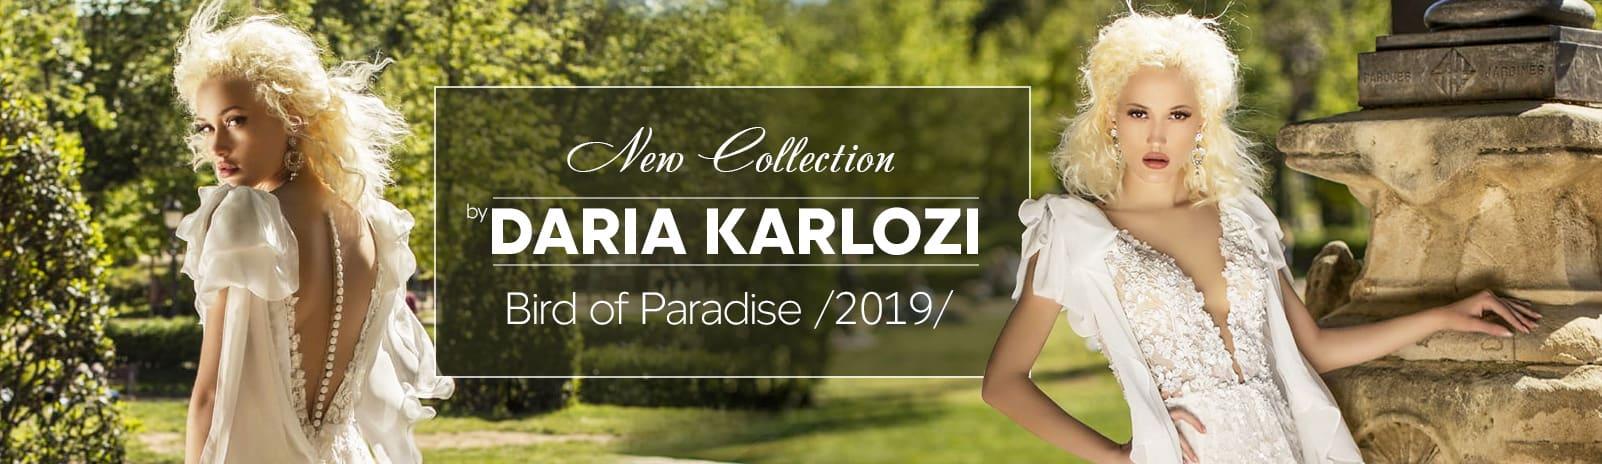 Daria Karlozi Bird of Paradise 2019